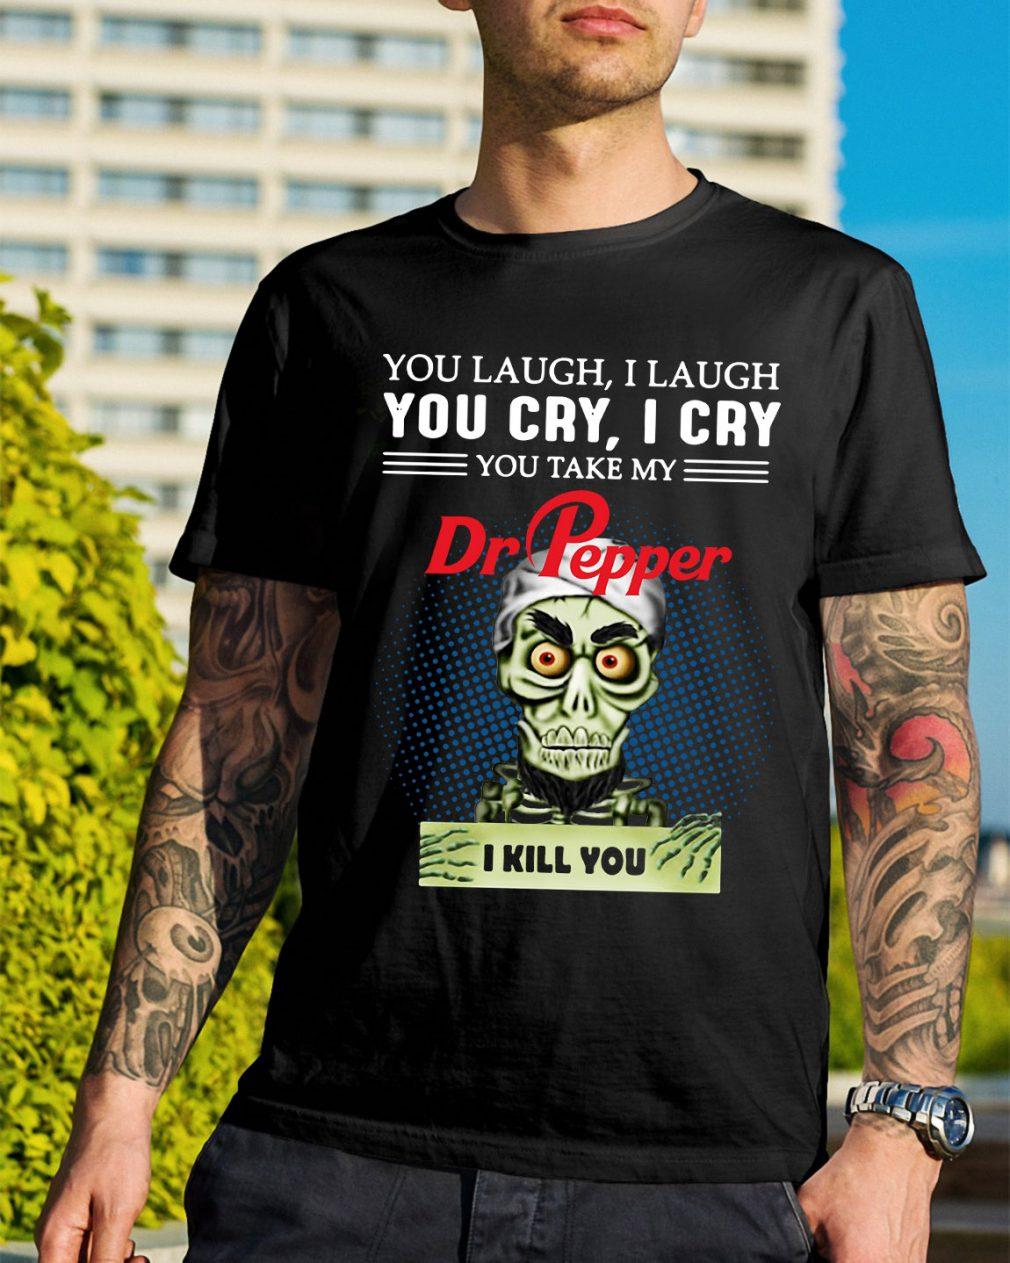 You laugh I laugh you cry I cry you take my Dr Pepper I kill you shirt